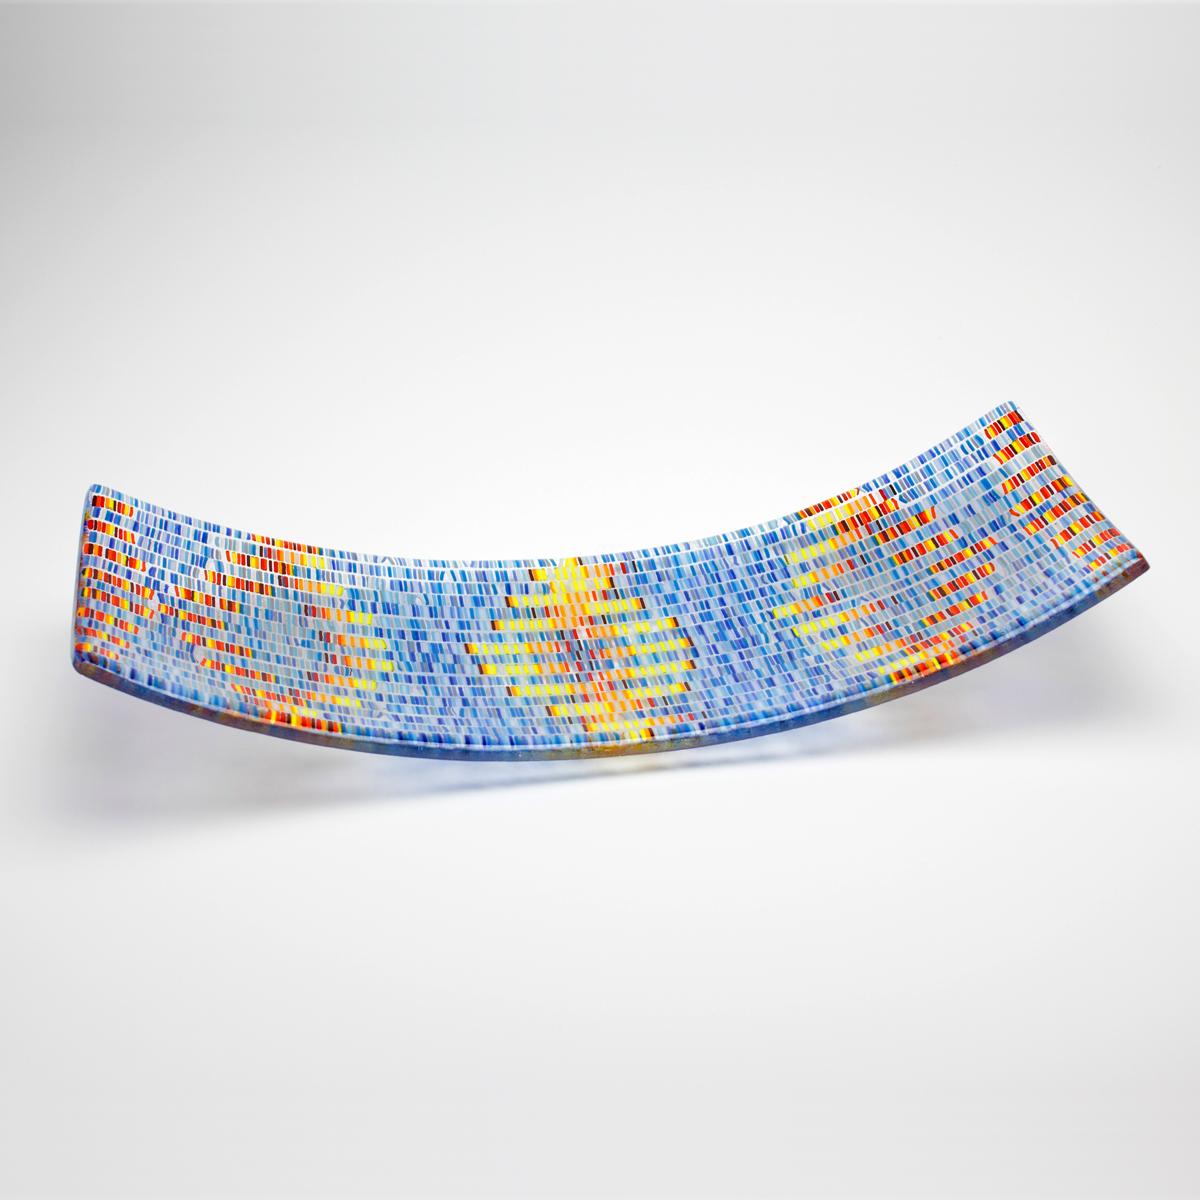 Arazzo Collection: Kilnformed Glass Platter by Galiani Glass Art